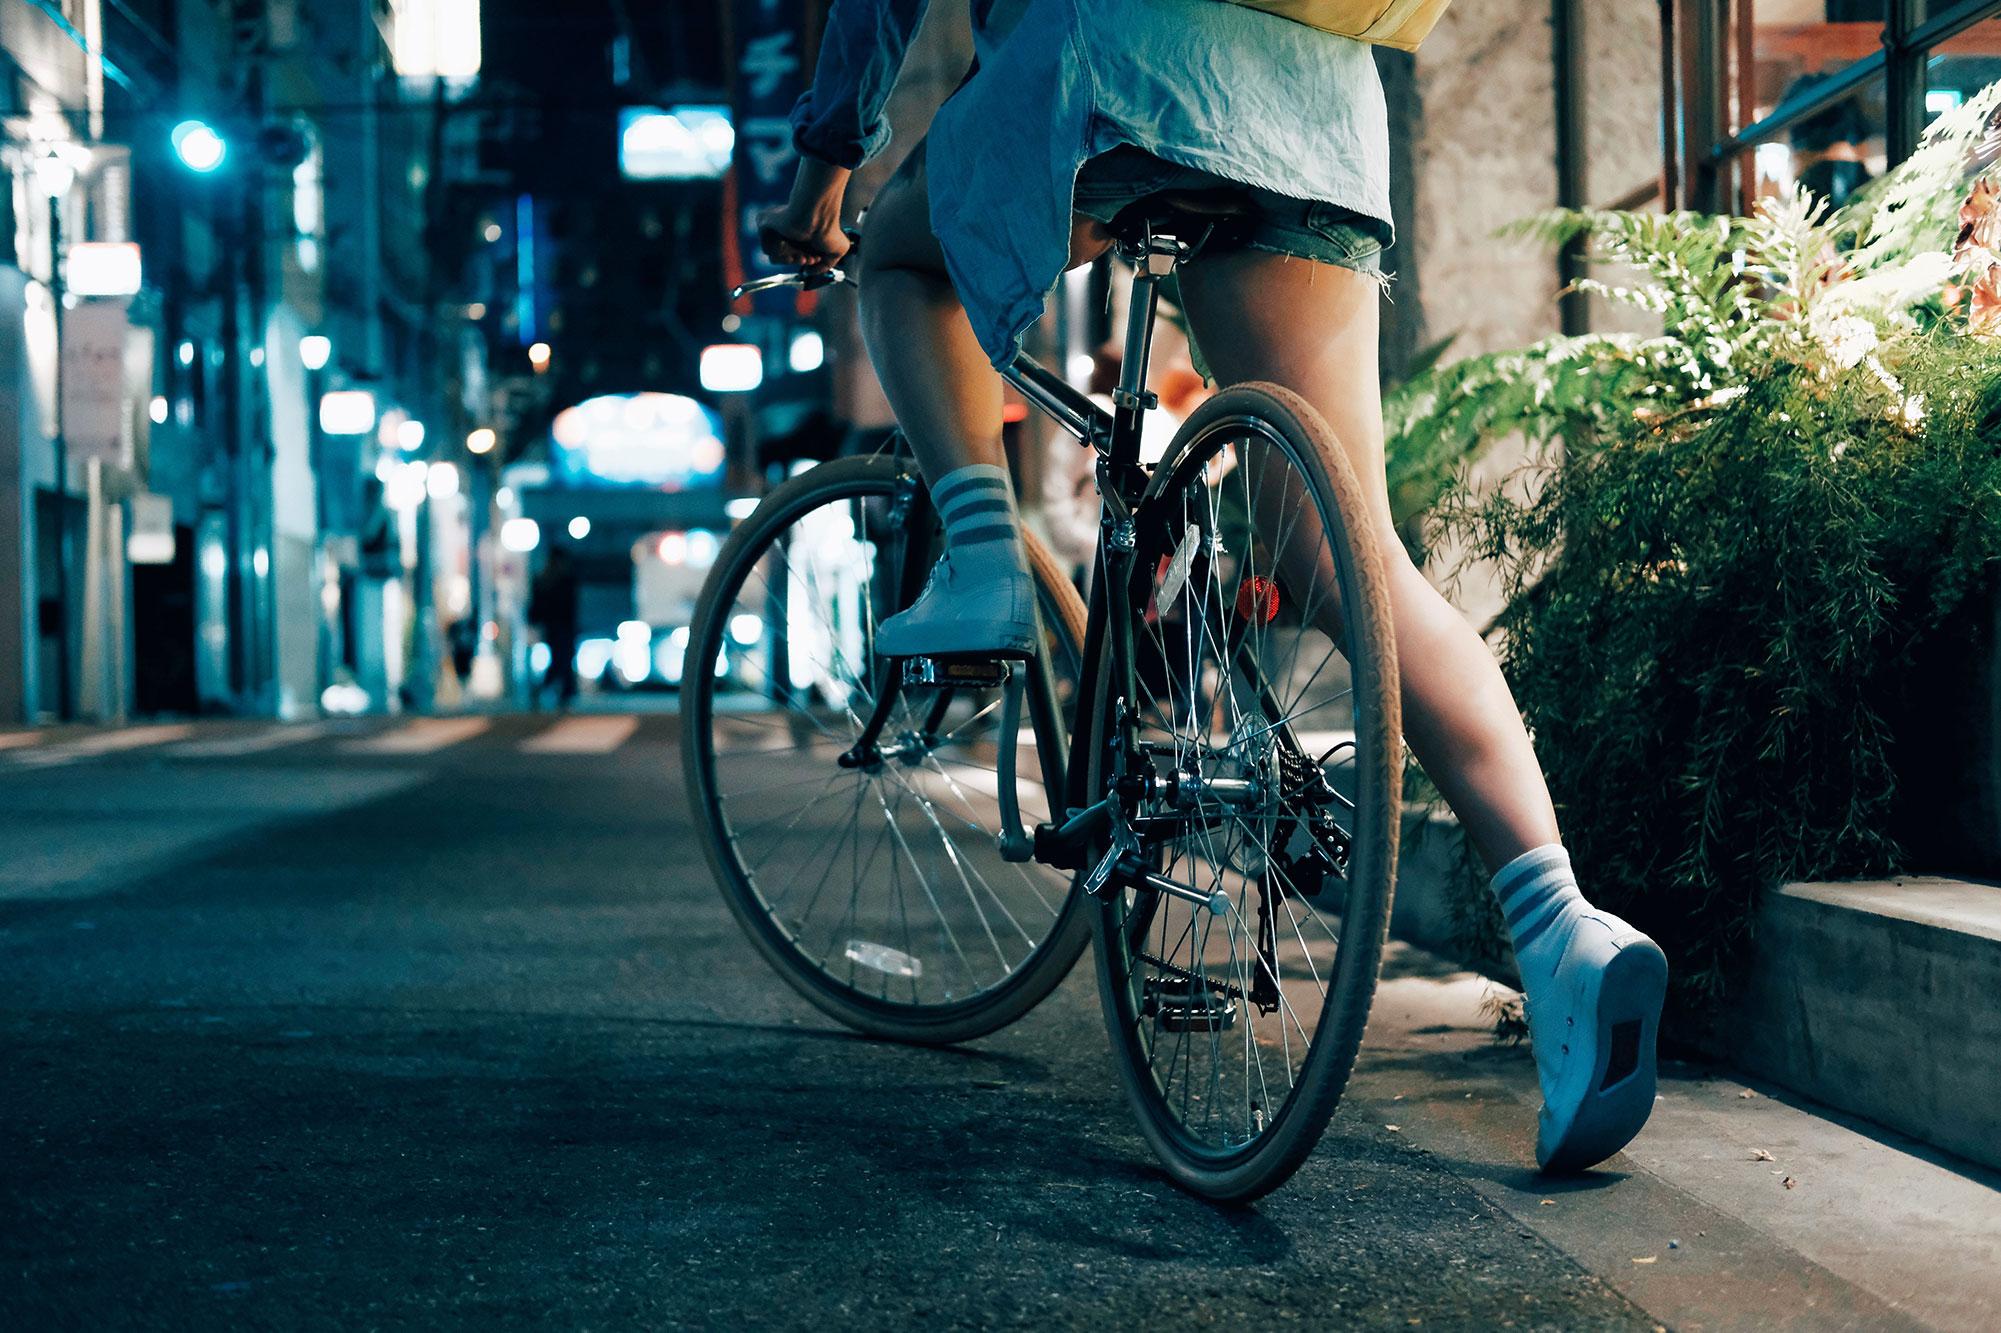 Cycling in Japan Bike